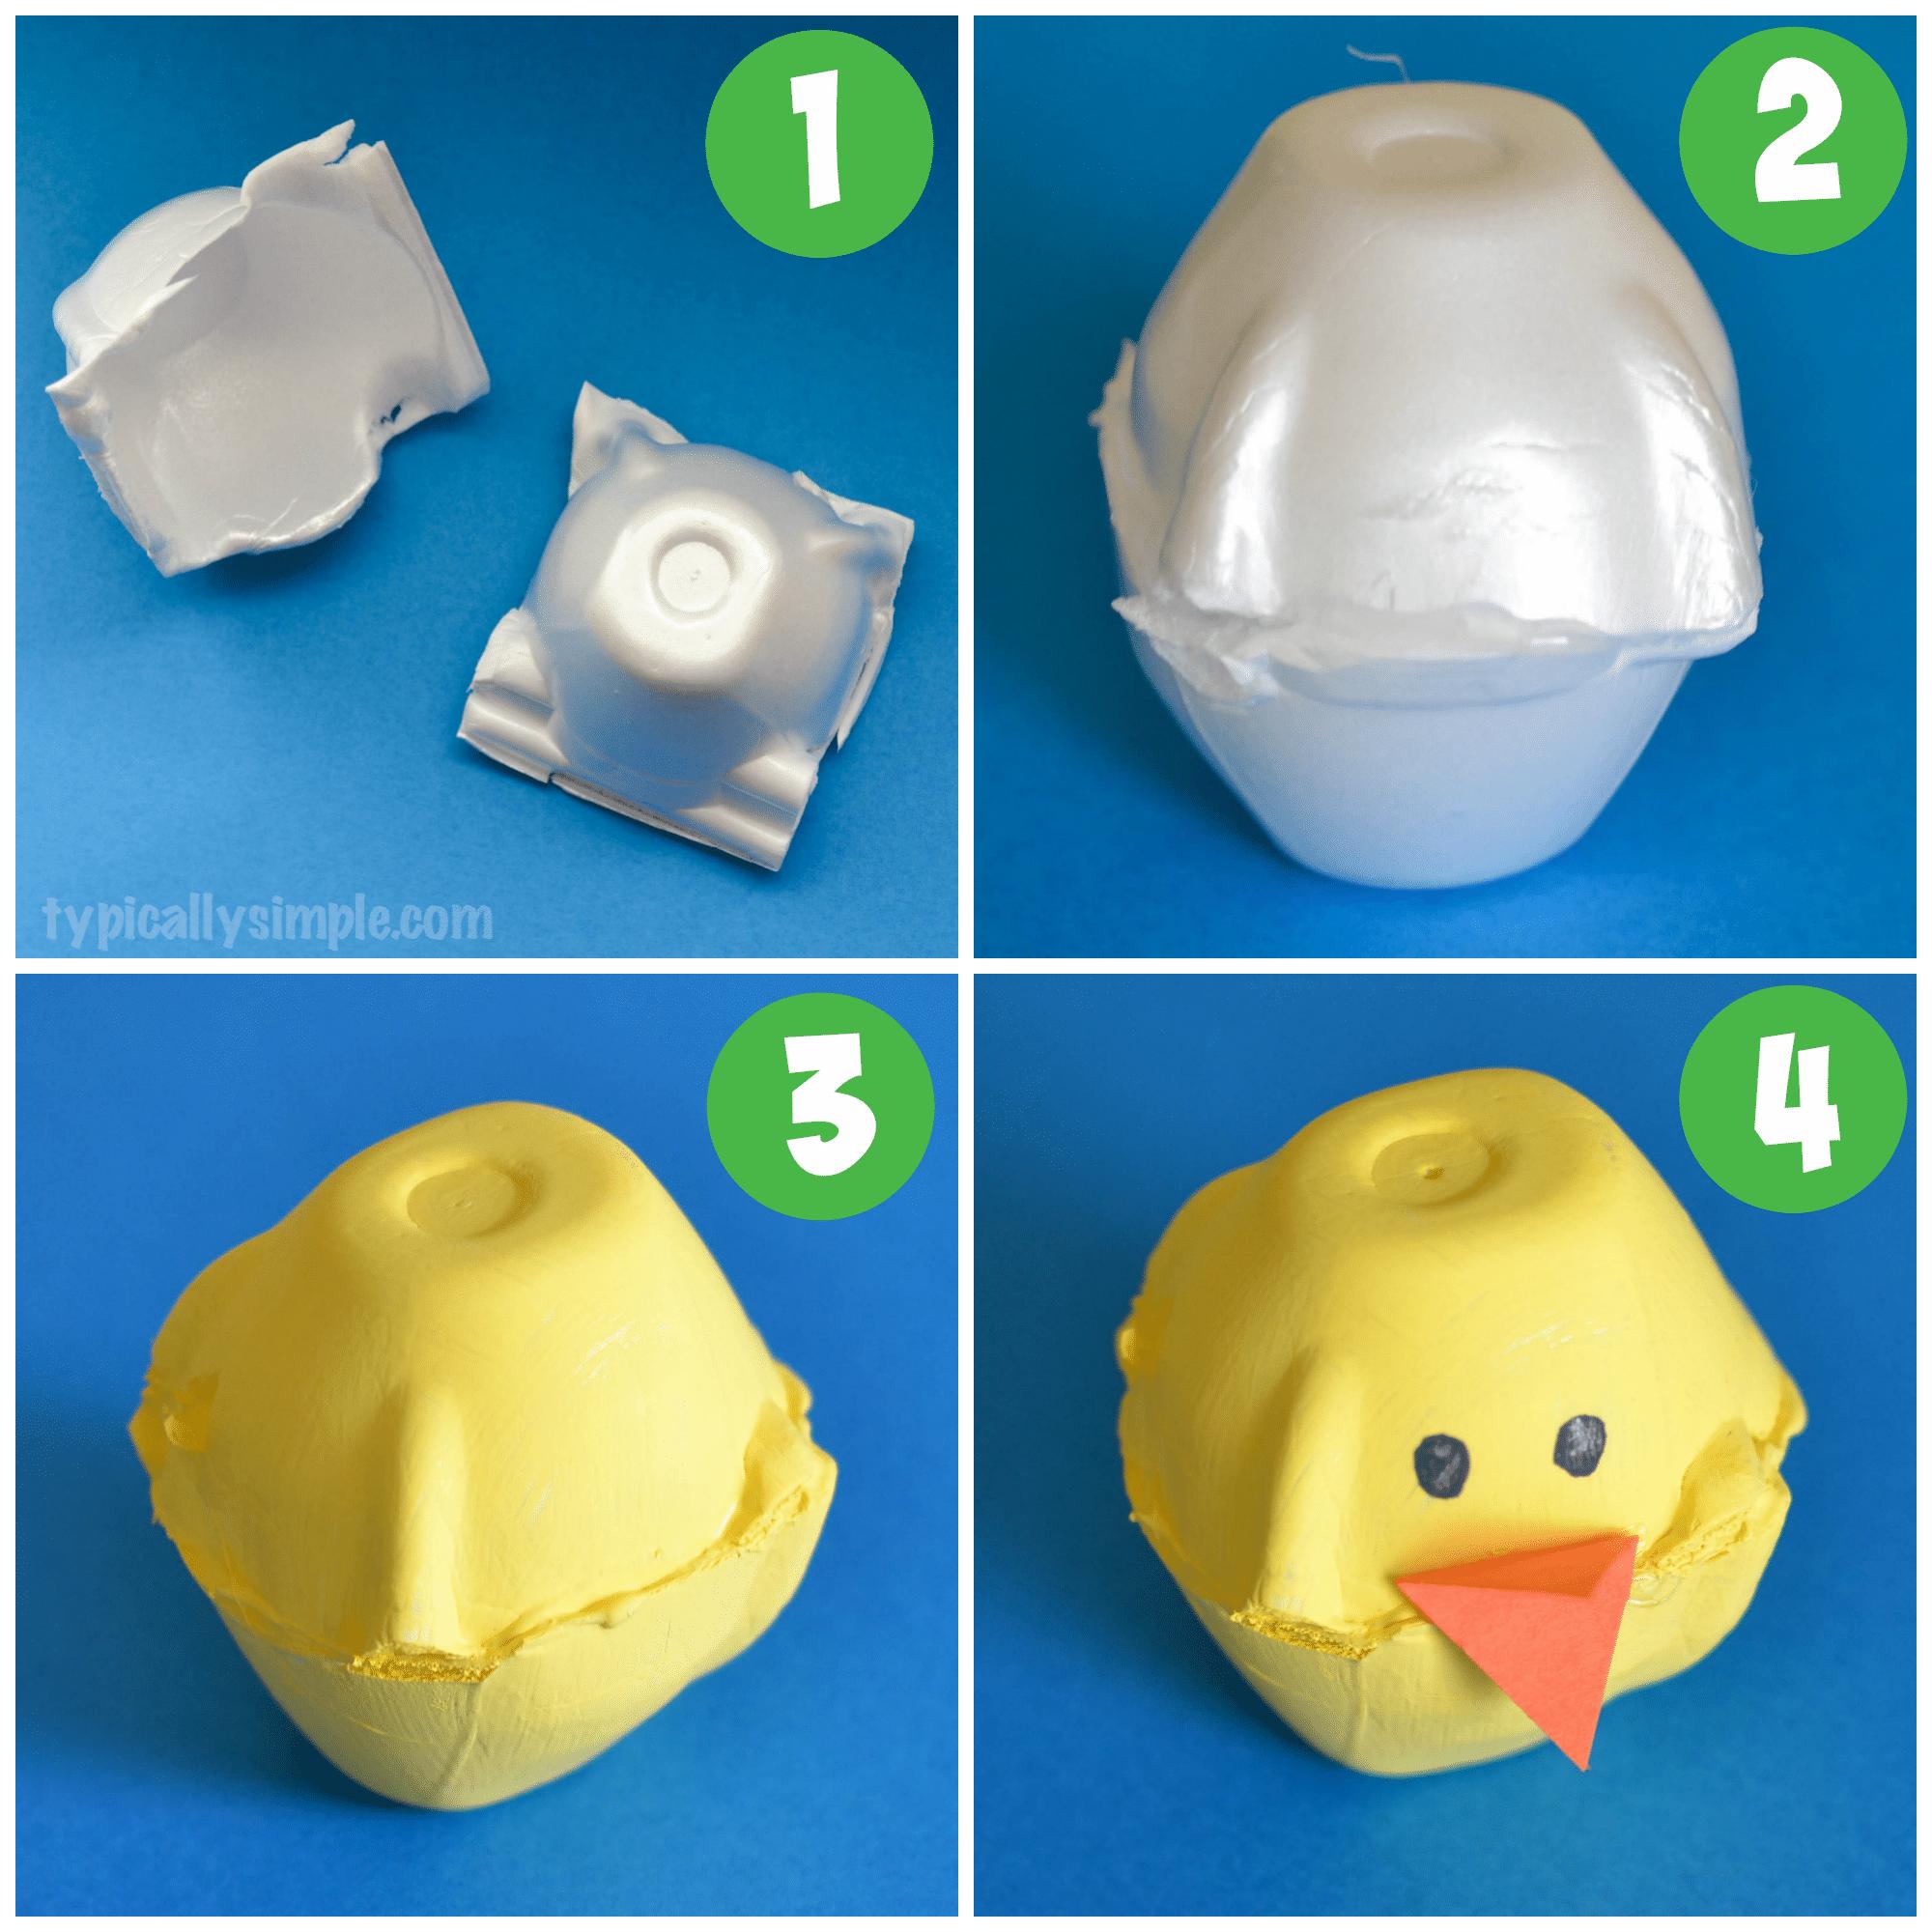 Spring Chicks Egg Carton Craft Typically Simple